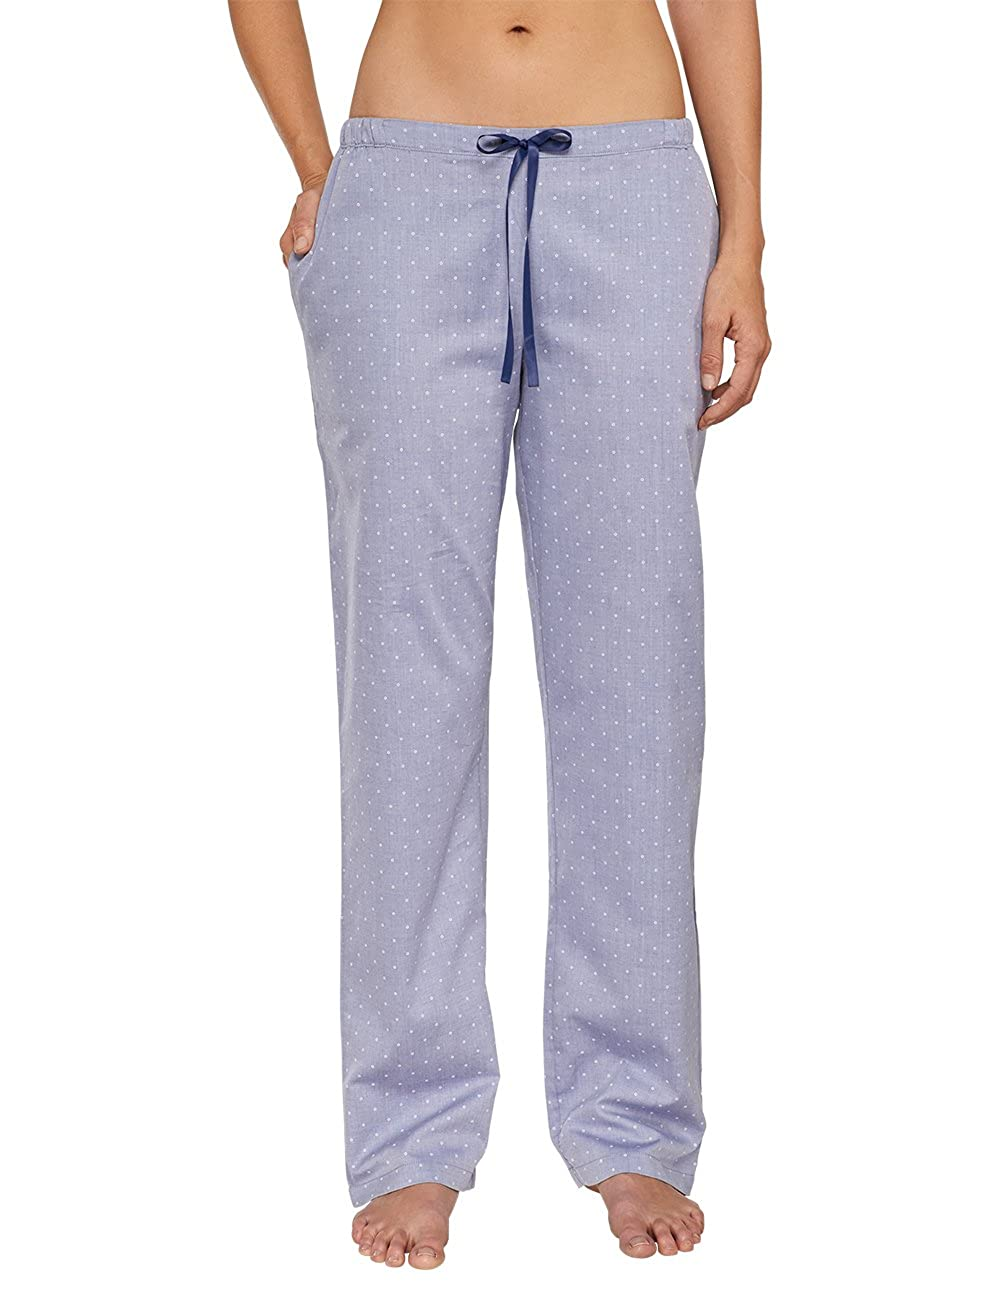 TALLA 44. Schiesser Mix & Relax Web, Pantalones de Pijama para Mujer